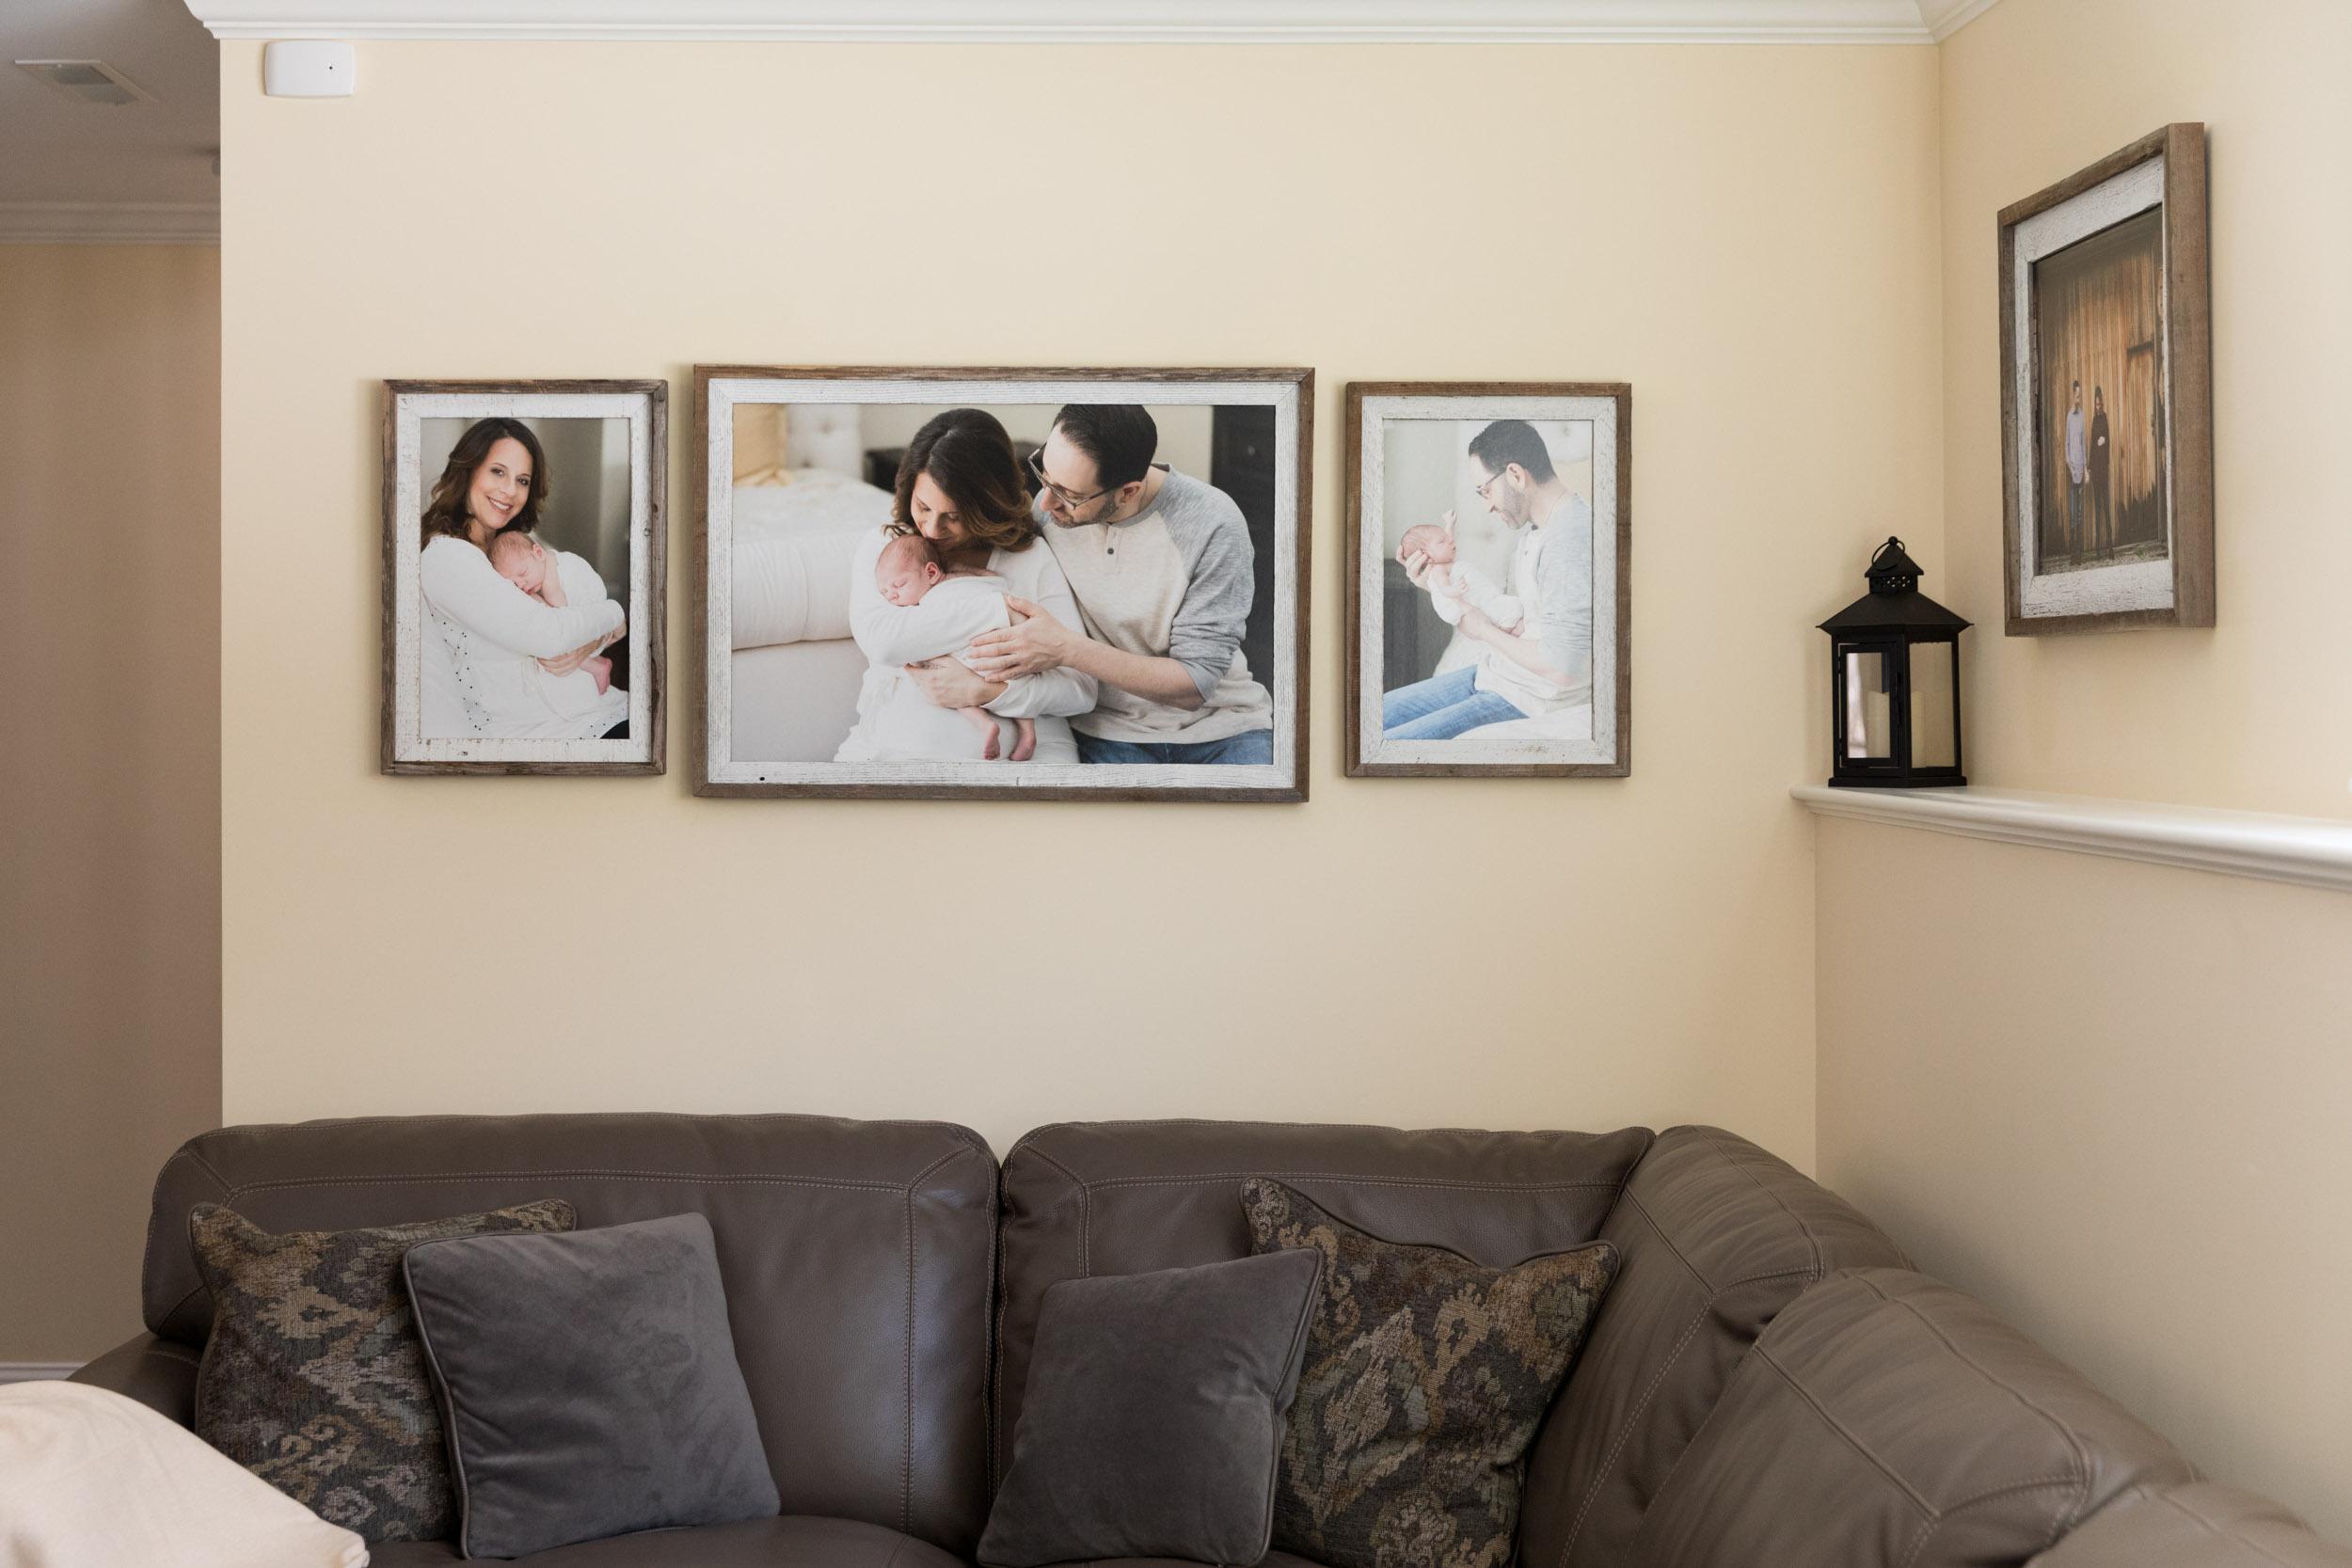 framed-family-photos.jpg